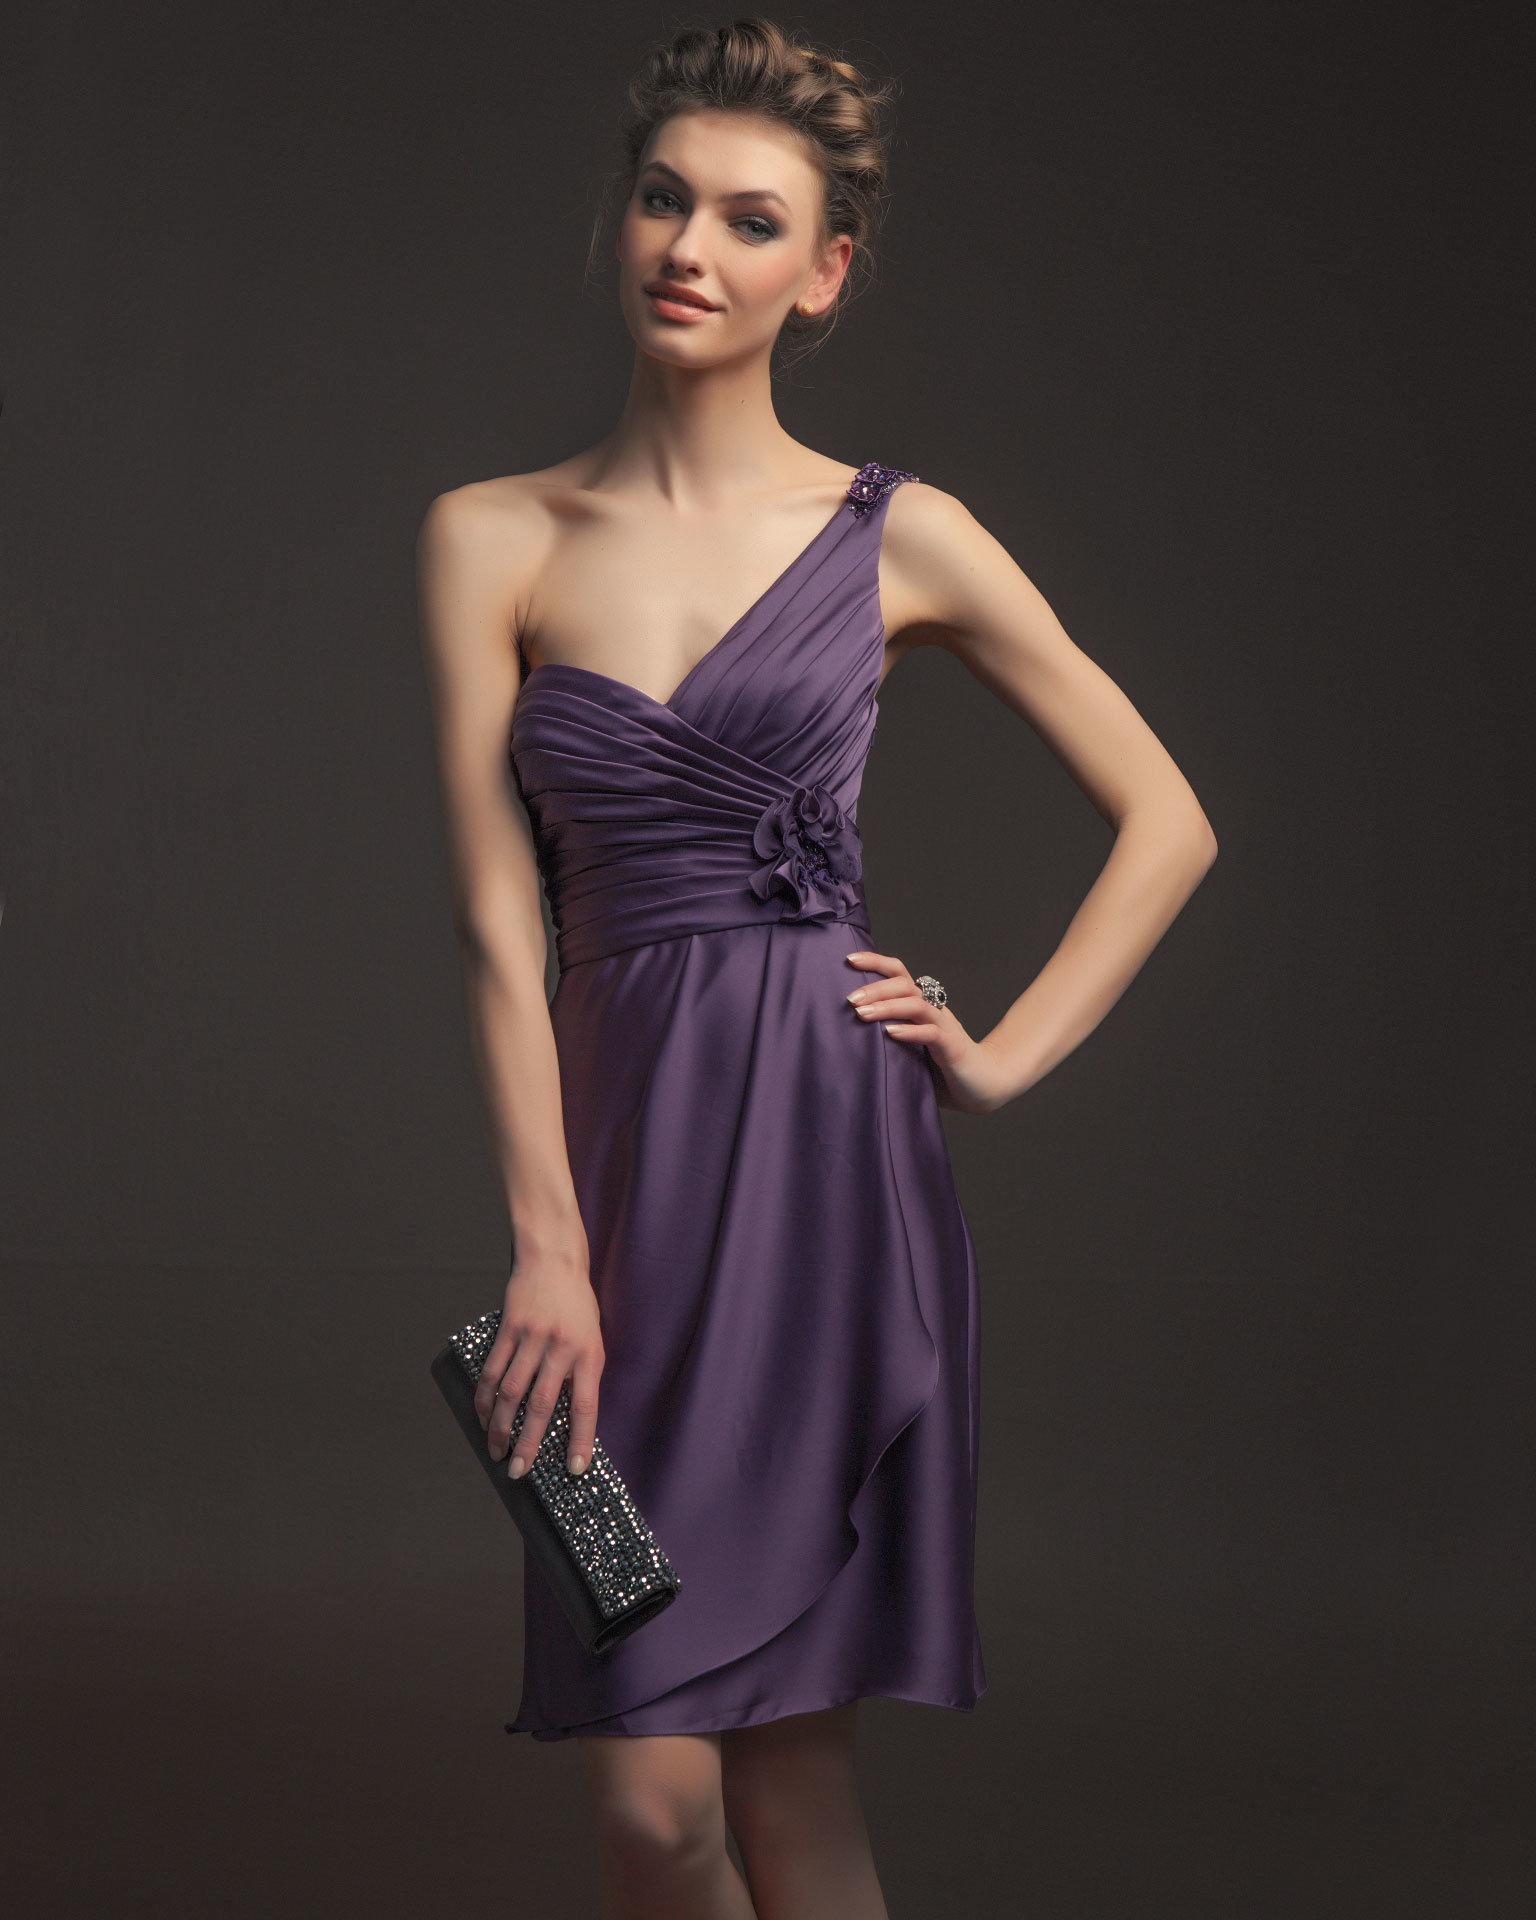 Elegant Short Evening Dresses - Boutique Prom Dresses